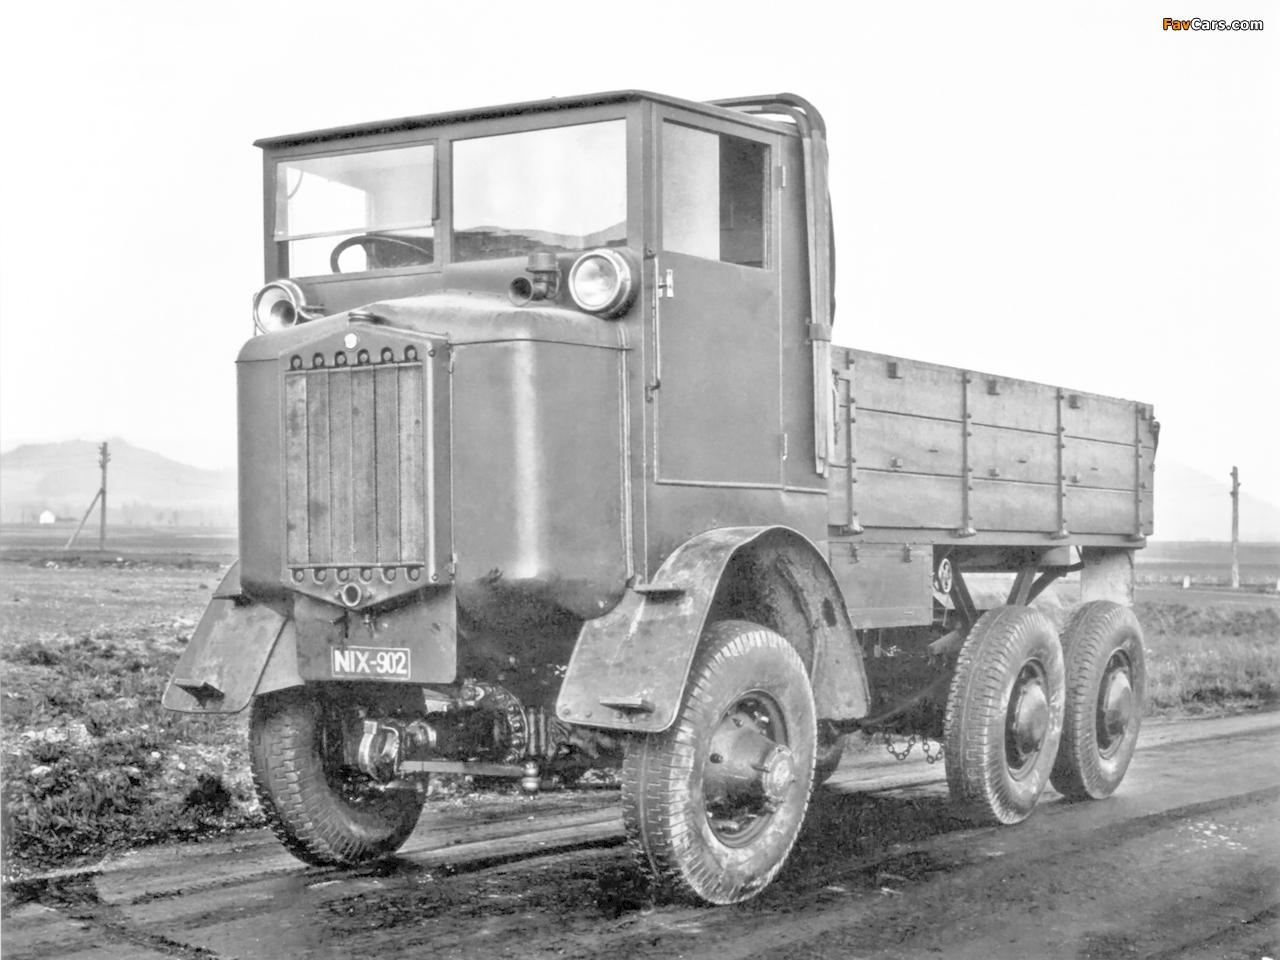 Tatra T25 6x6 Tractor Prototype 1926 photos (1280x960)